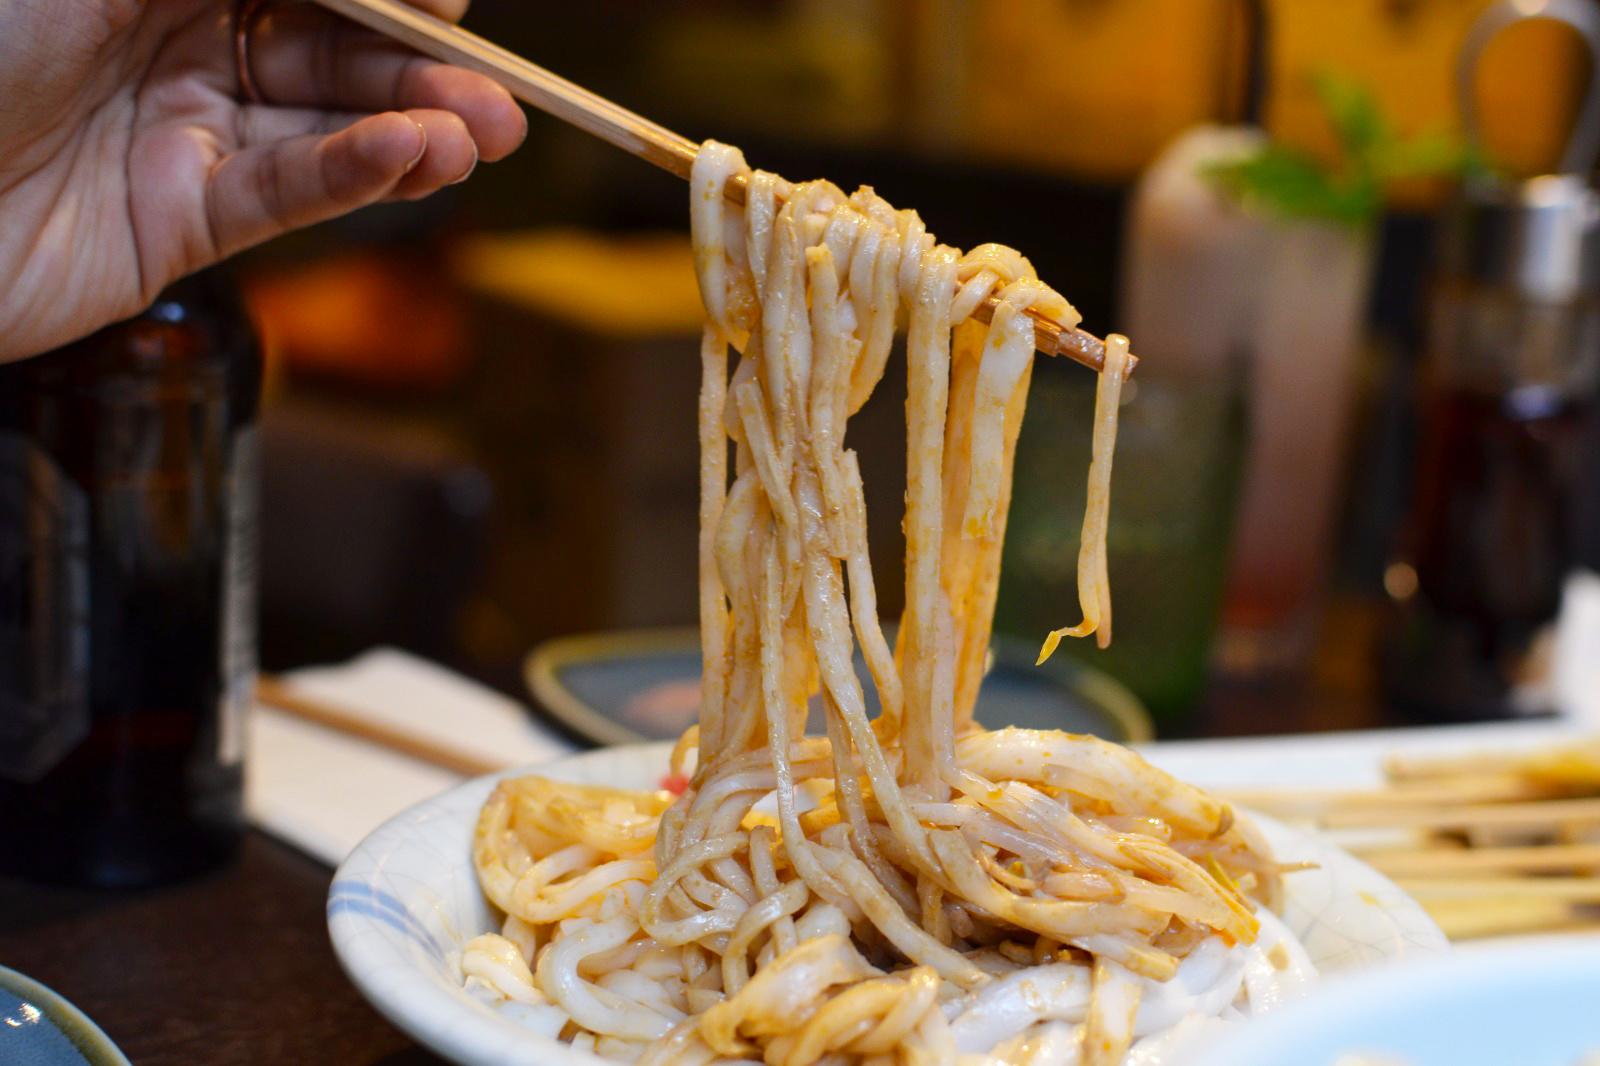 cold rice noodles with sesame sauce at Murger Hanhan